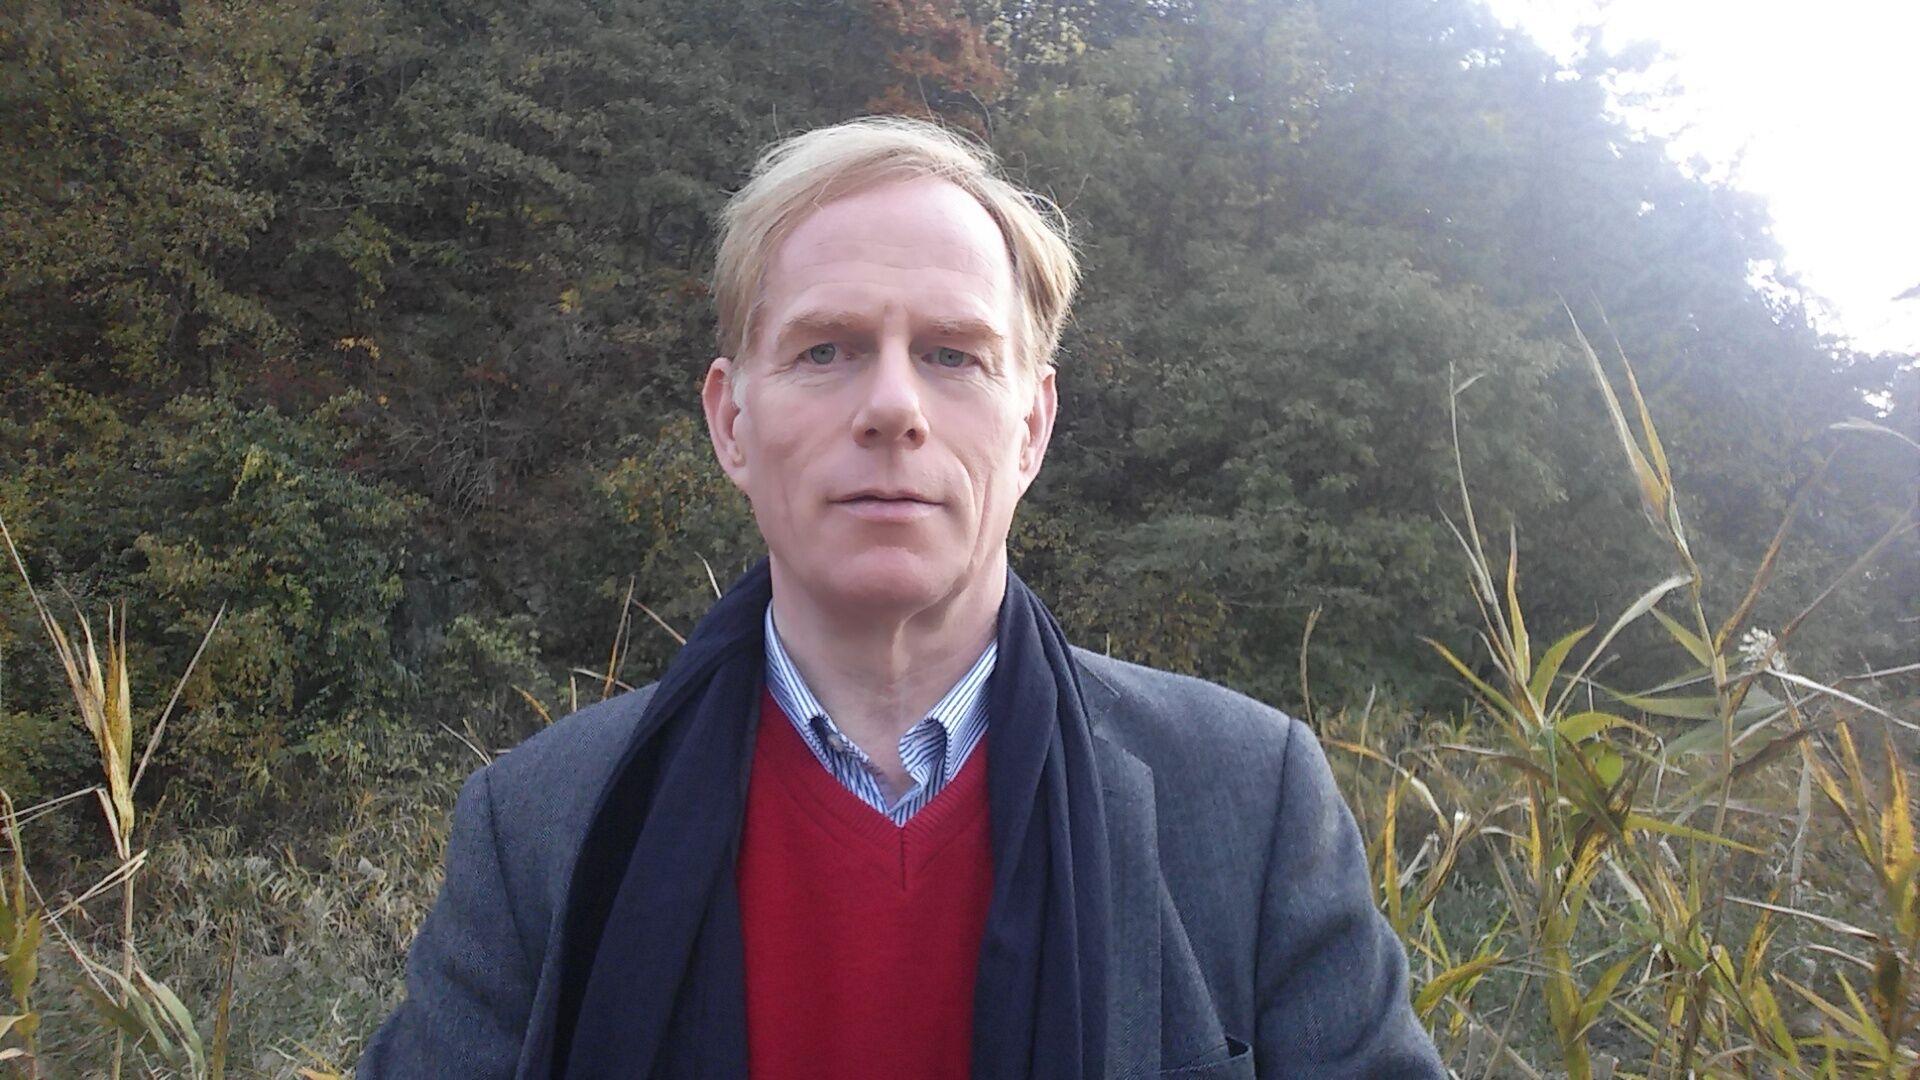 David Wood - Director, Humanity+. Writer and Entrepreneur